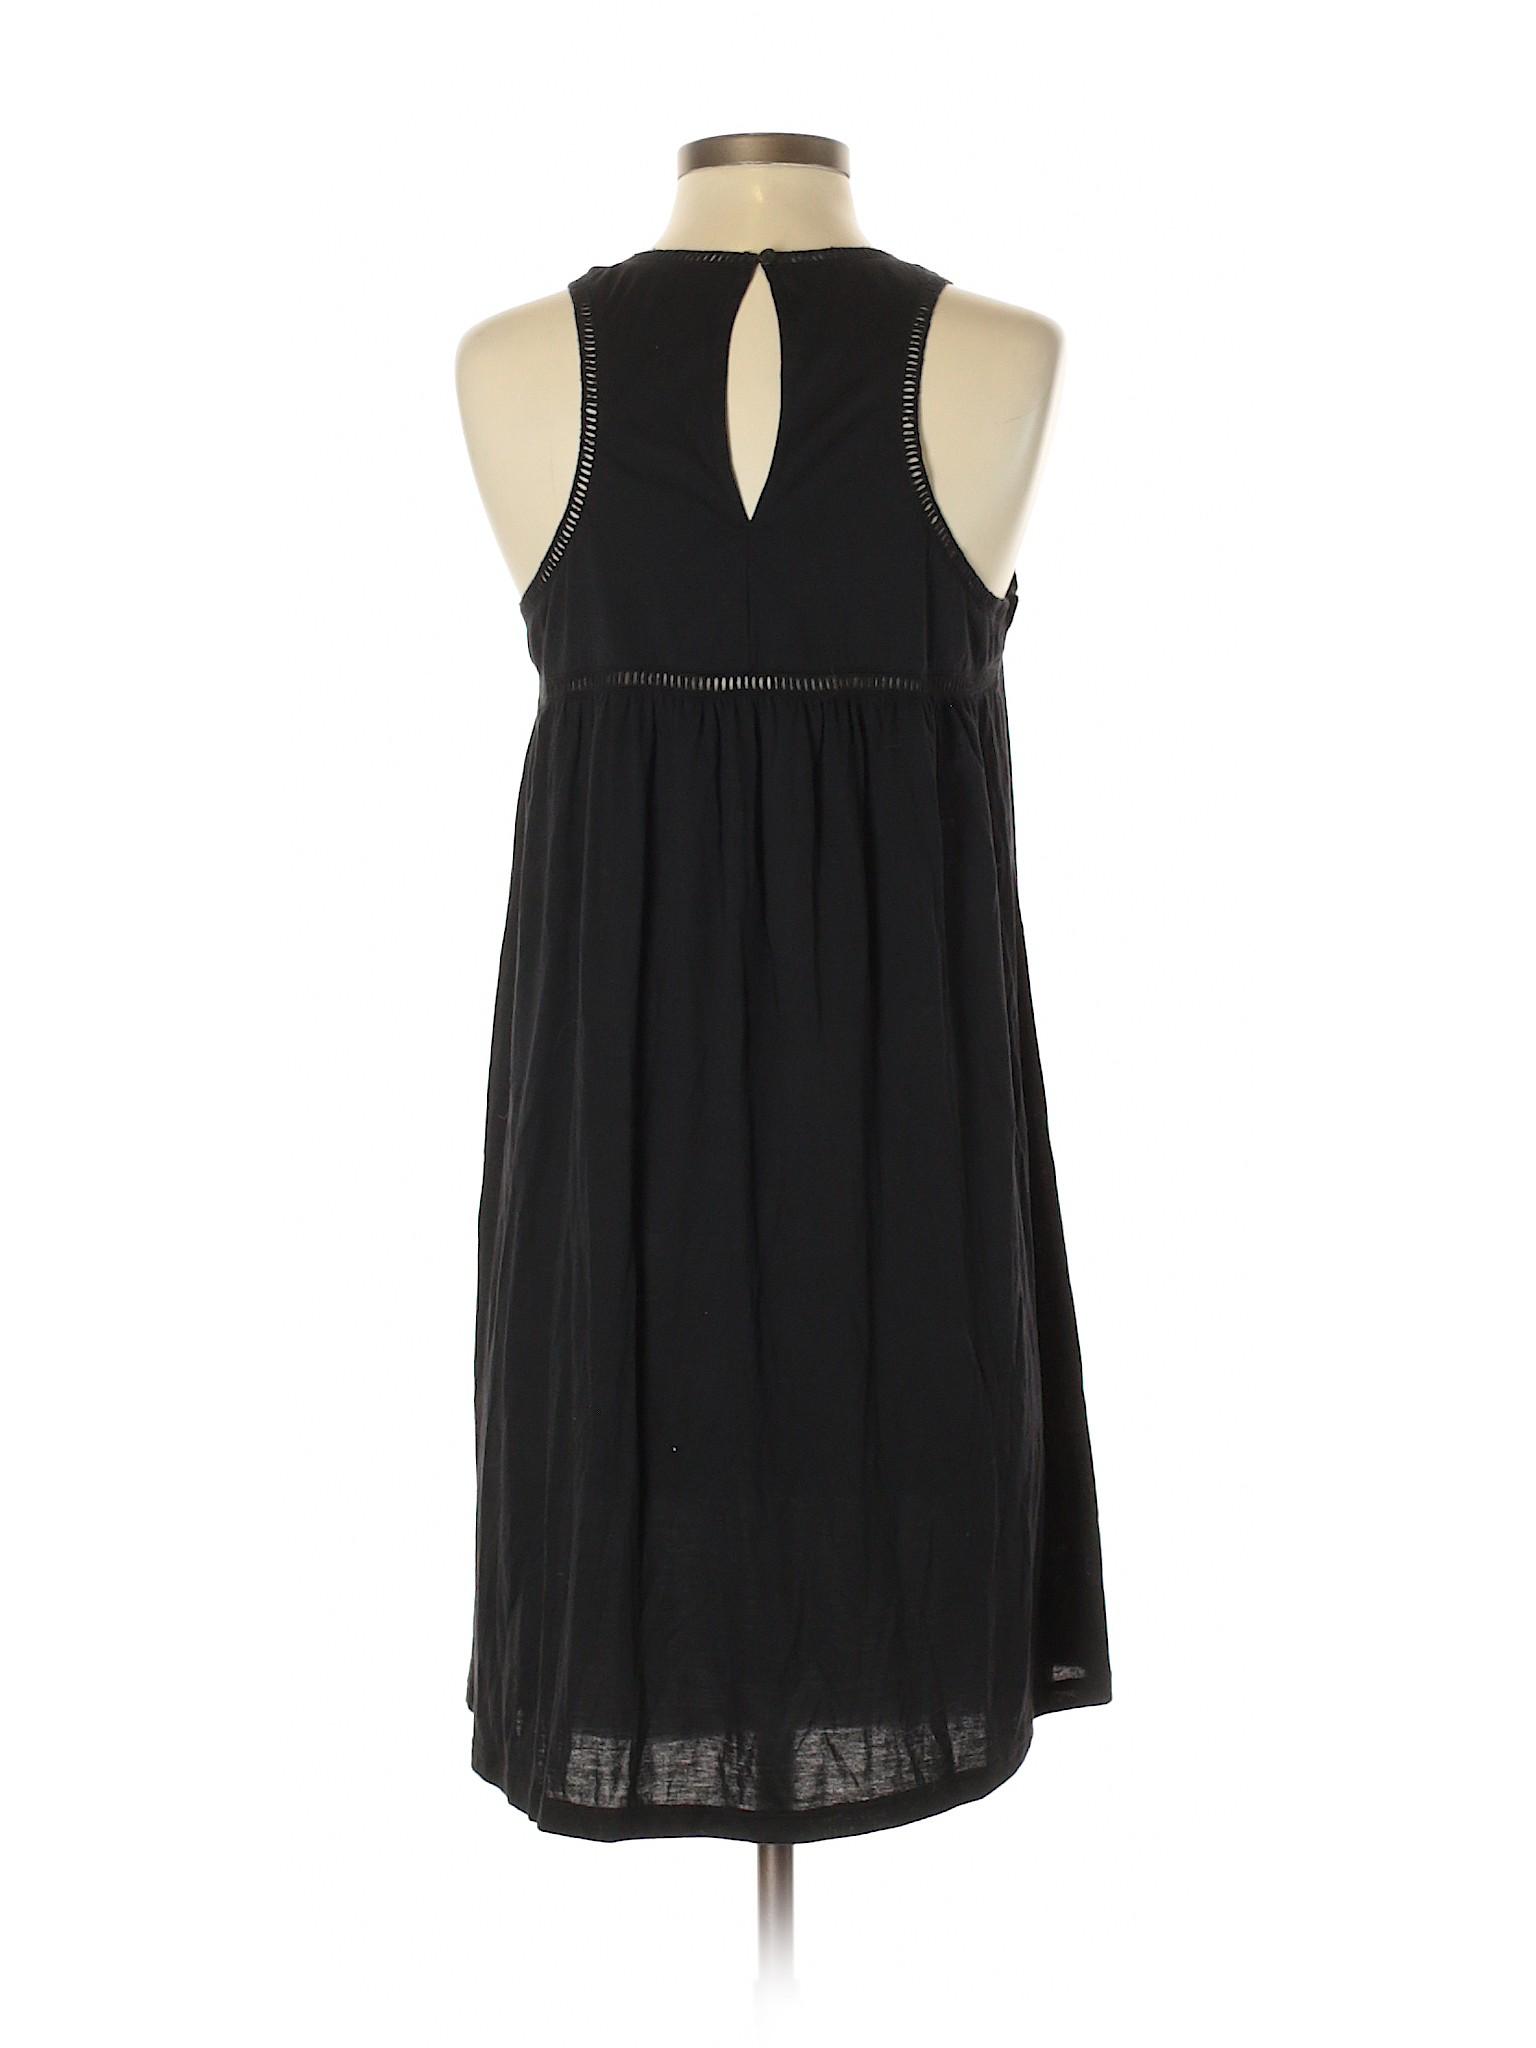 Loft Dress Winter Taylor Casual Ann Boutique pWx4RwqWf